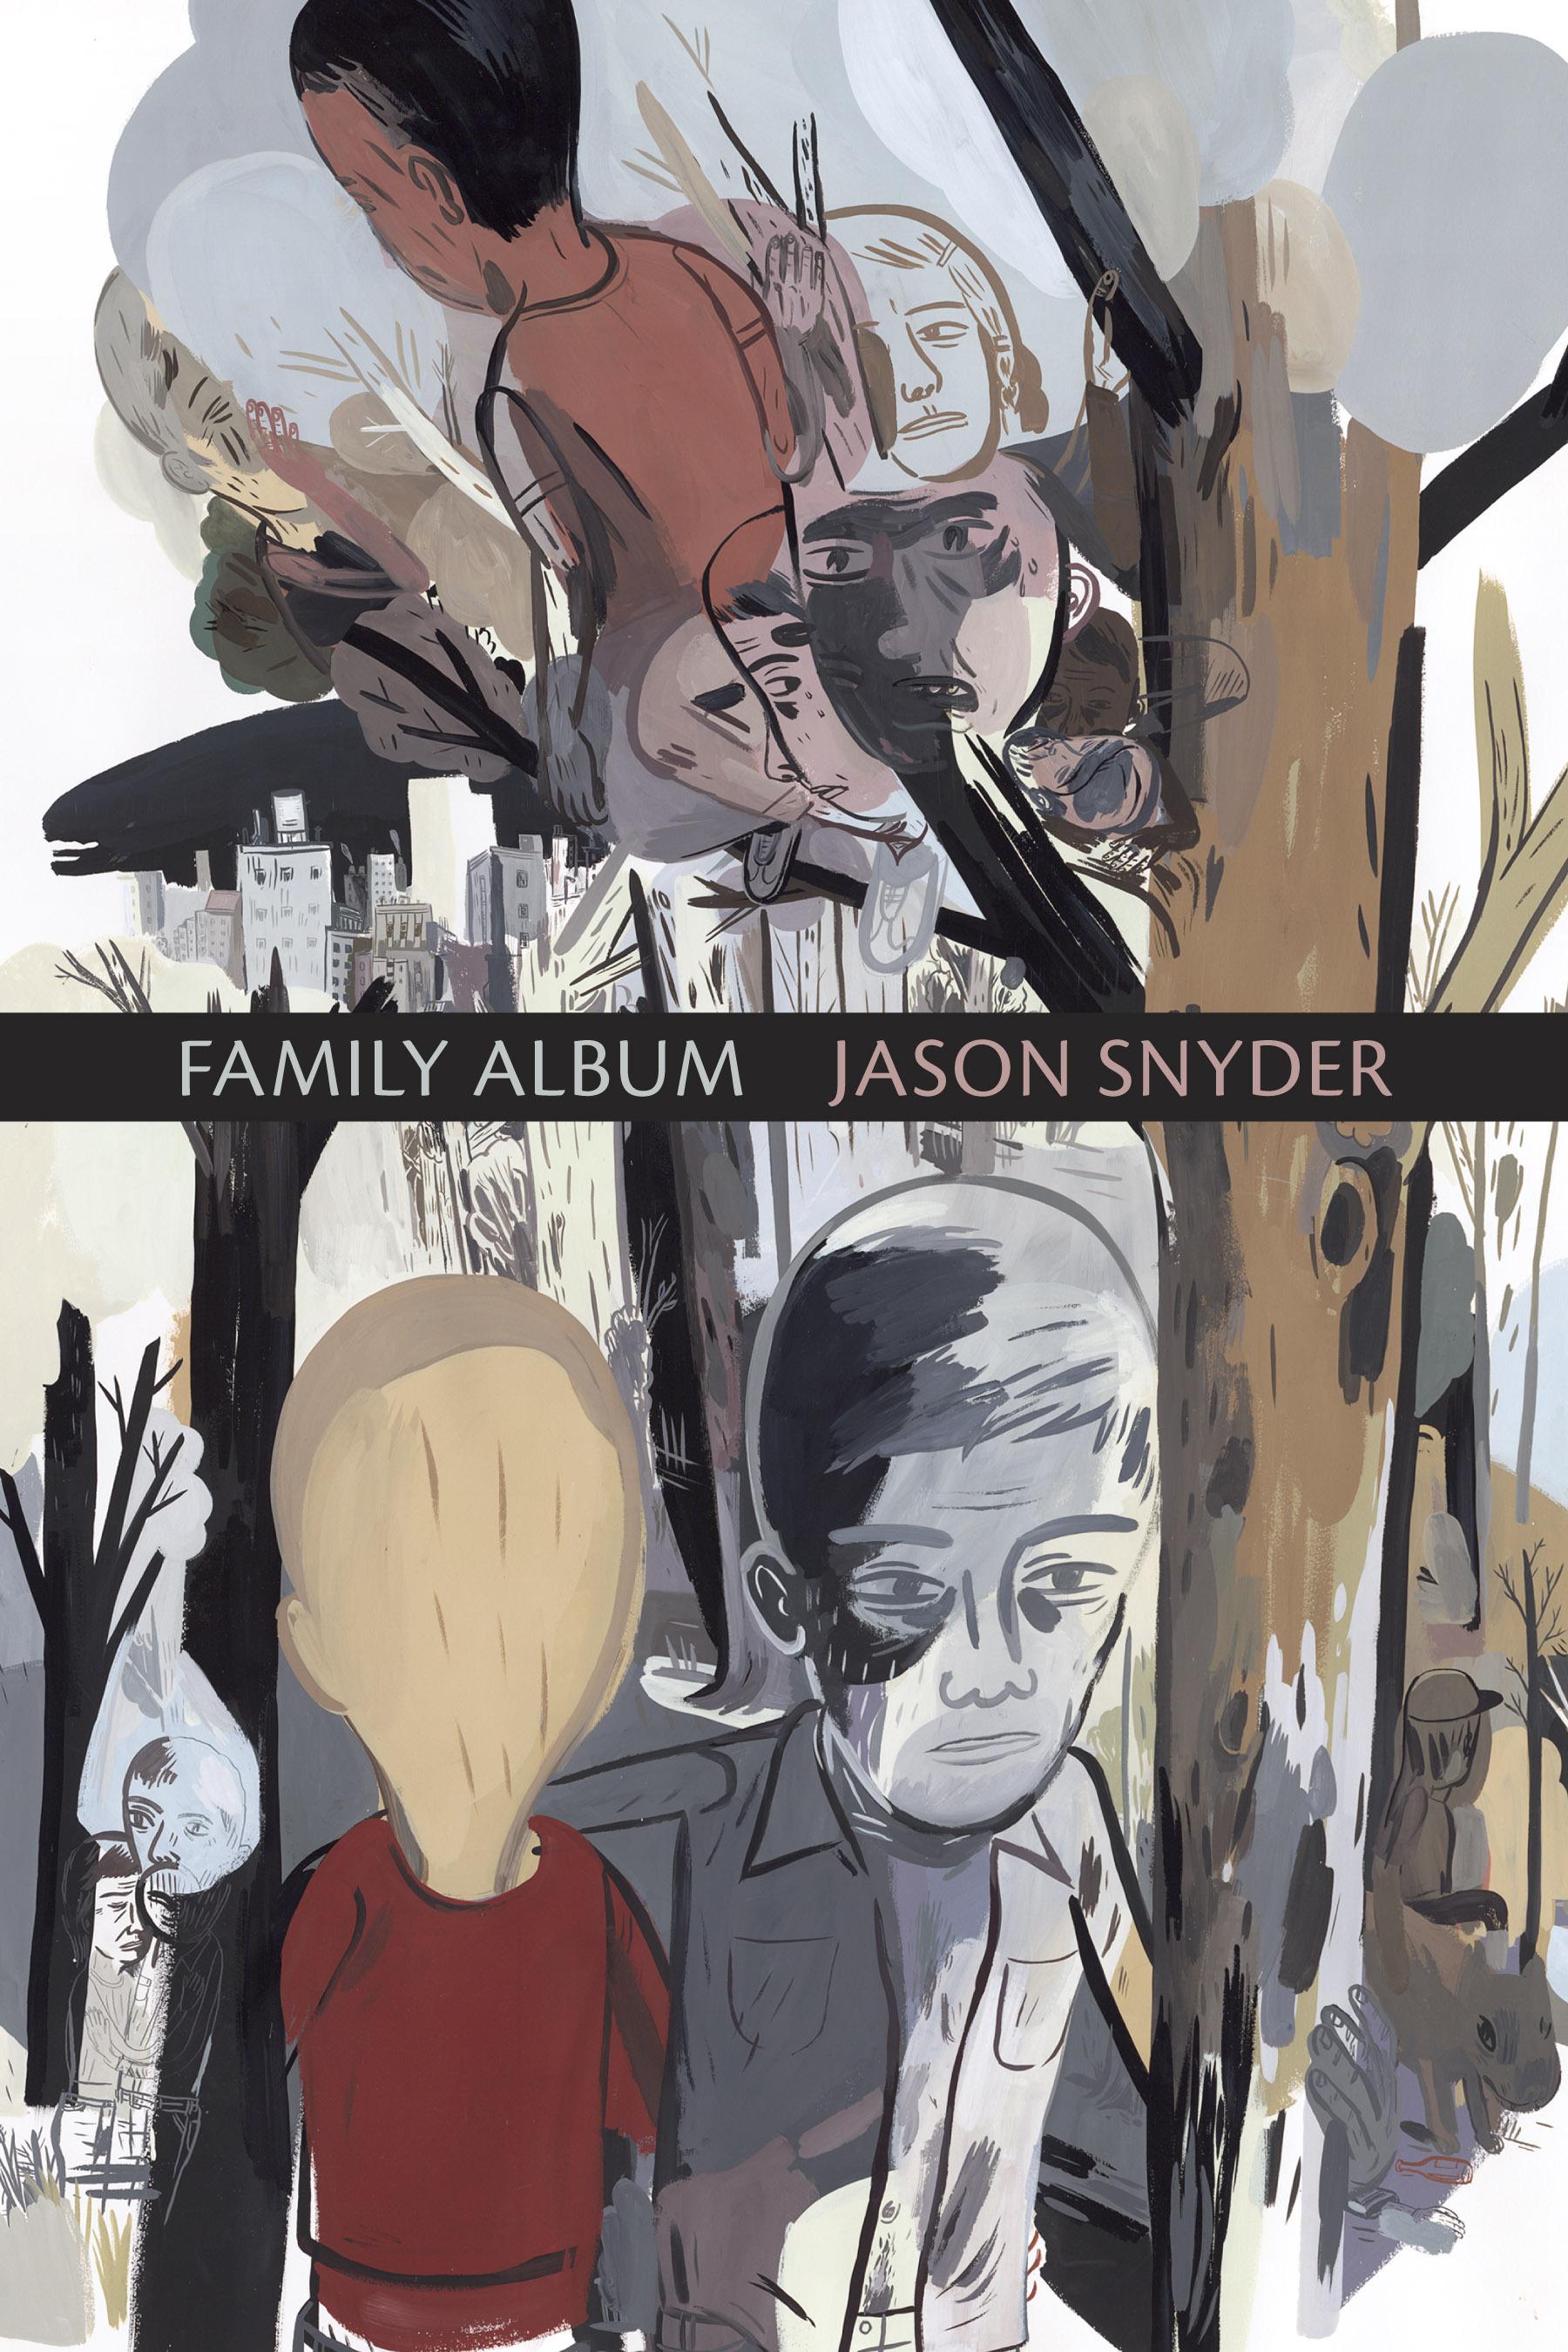 Family Album Jason Snyder